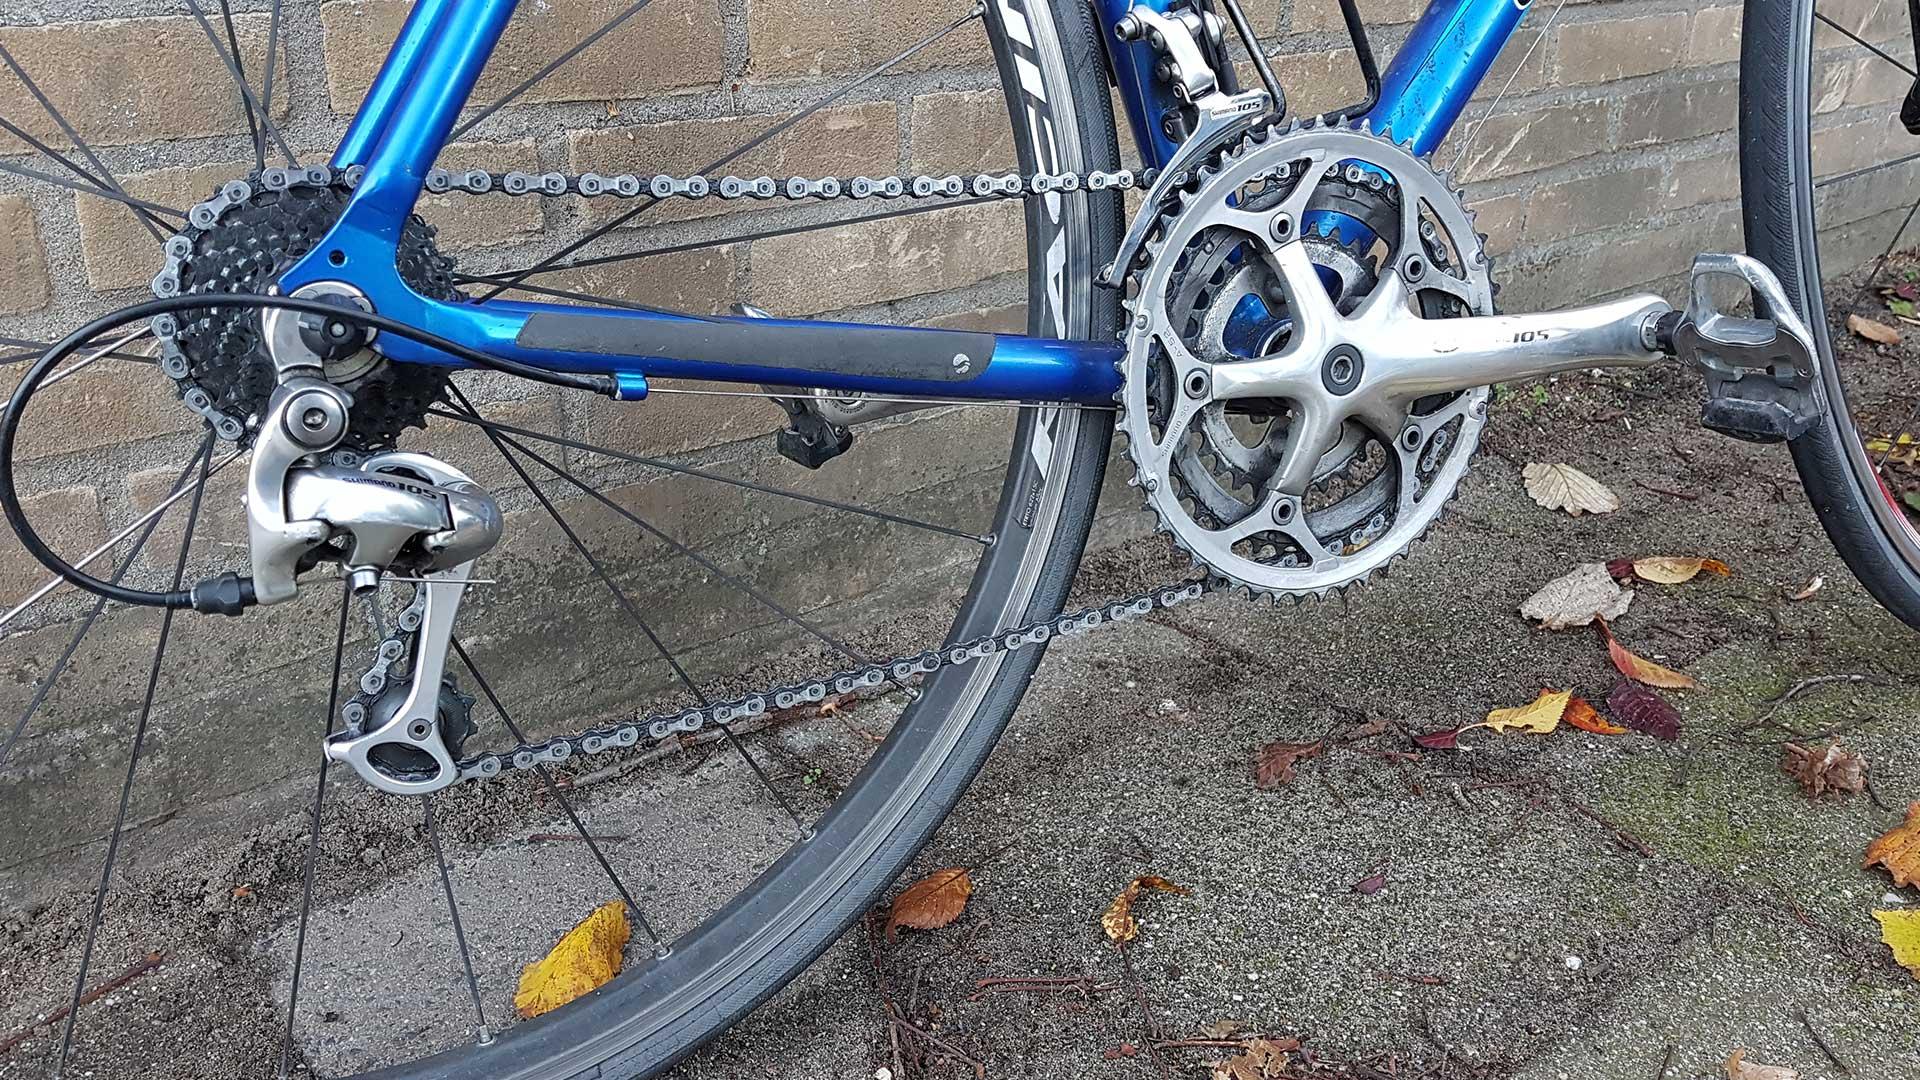 Goedkoop wielrennen en mountainbiken: drie handige tips